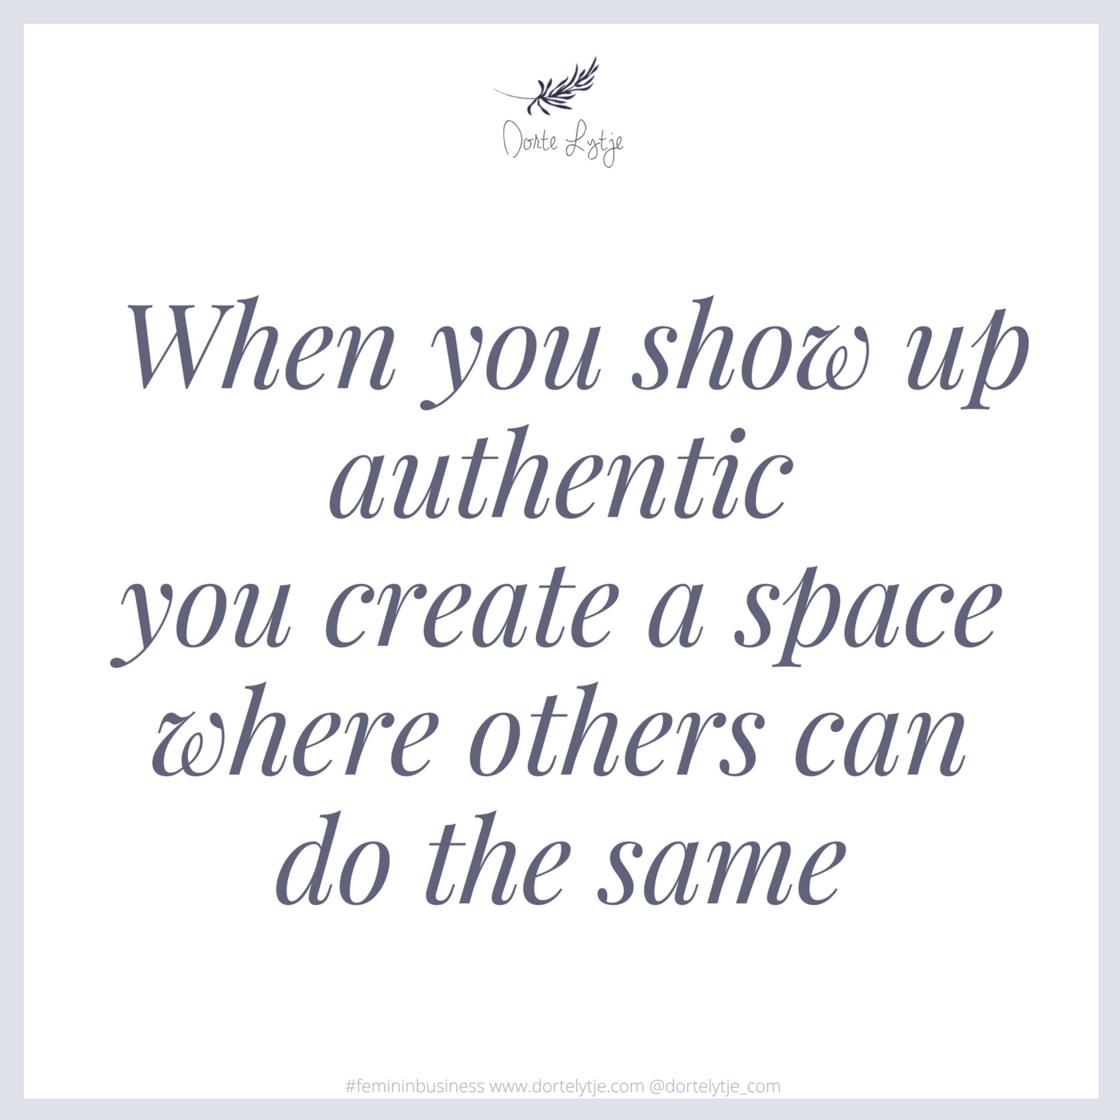 Dorte Lytje citat when you show up authentic.png